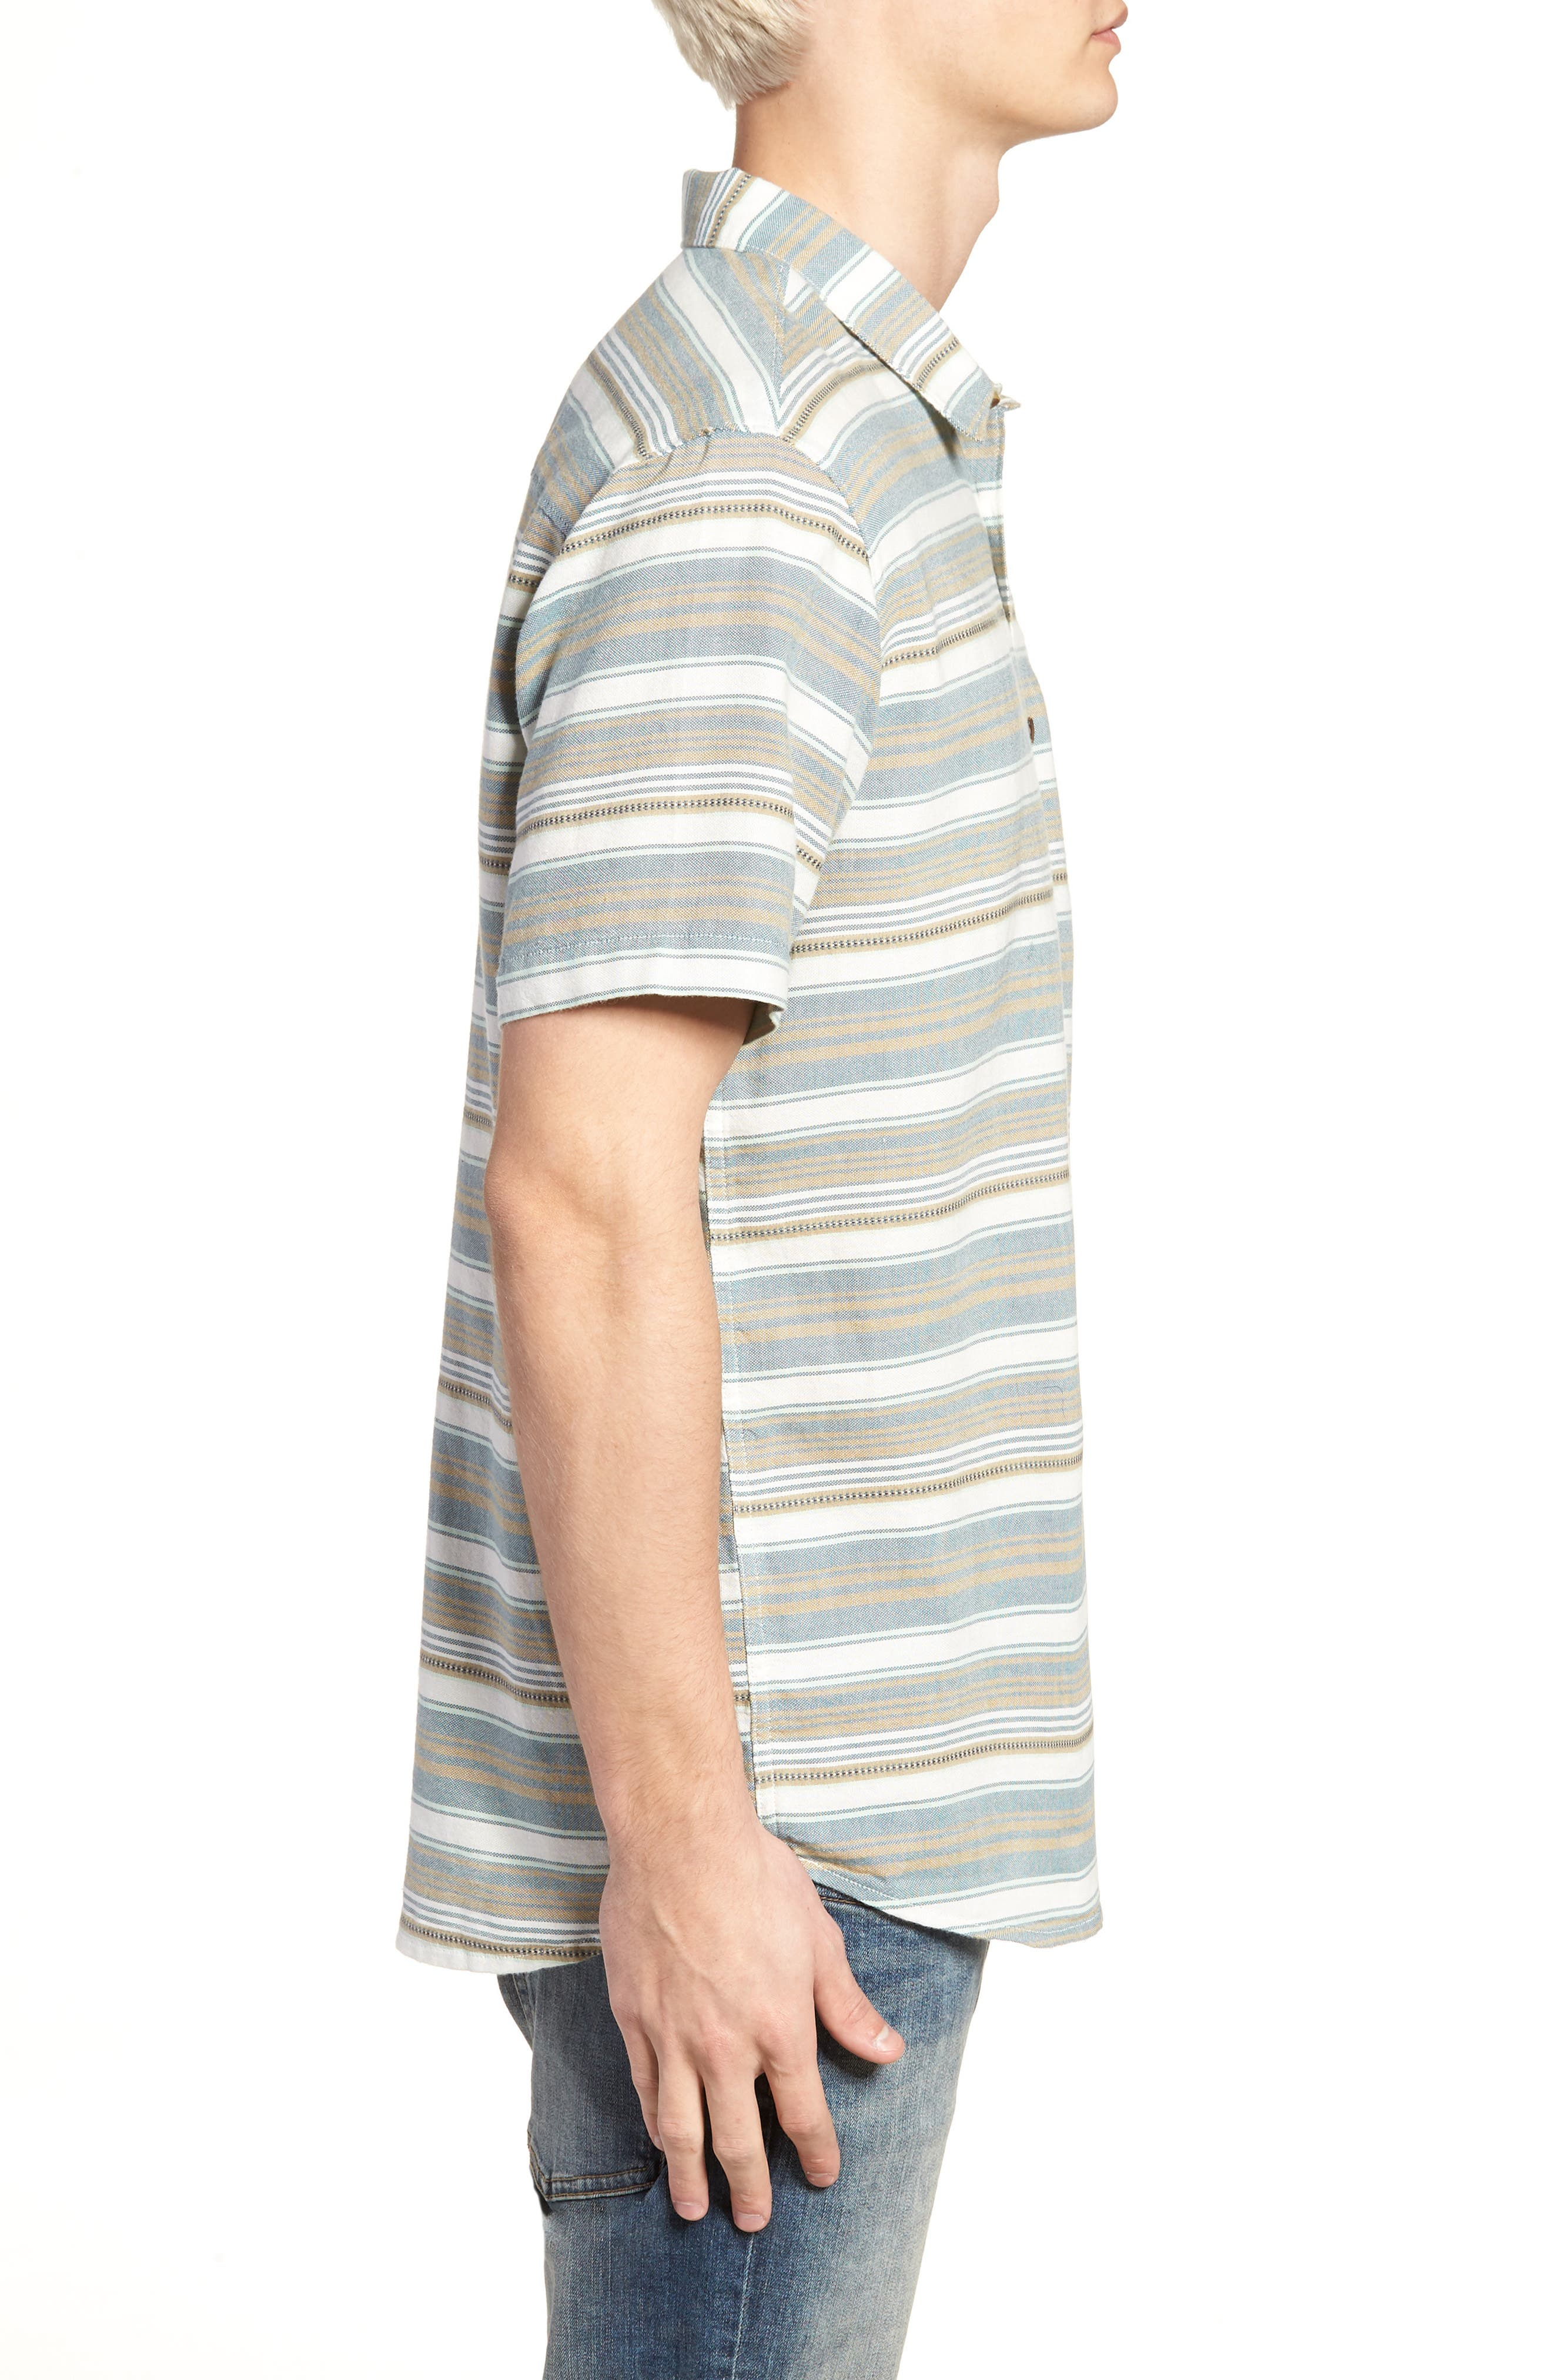 Currington Short Sleeve Shirt,                             Alternate thumbnail 3, color,                             251